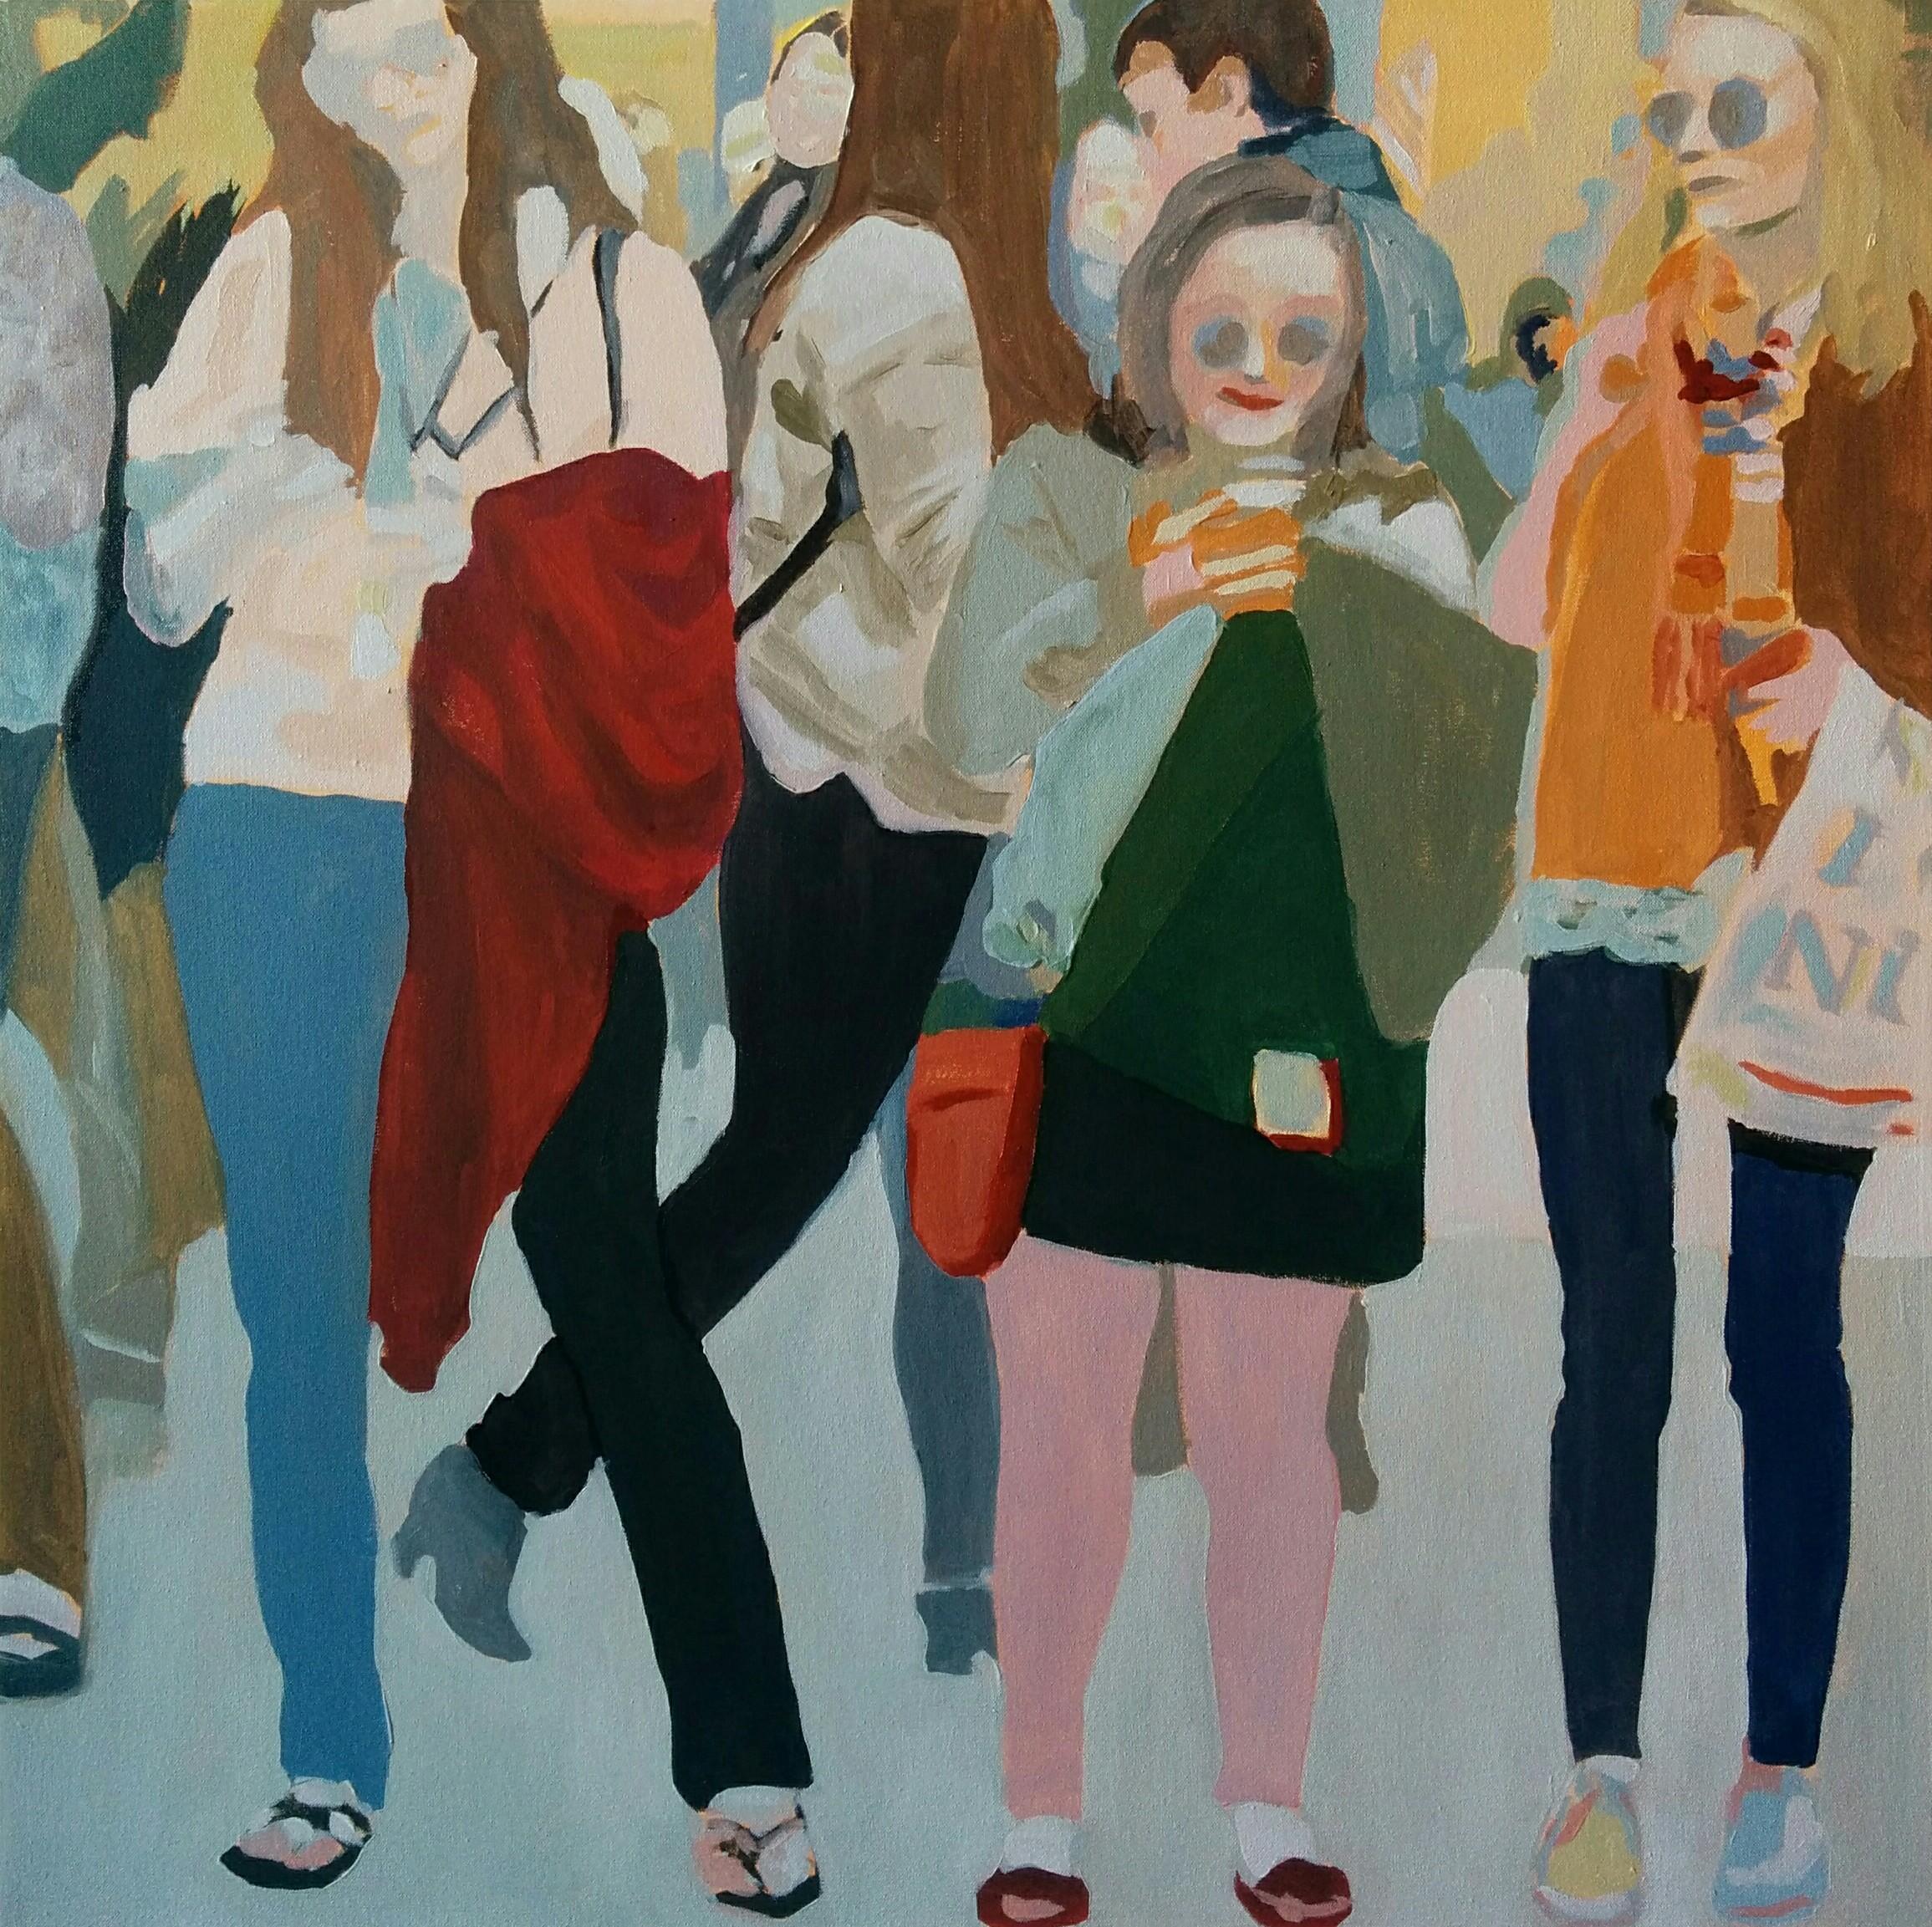 "Lenox Hill, 2016, 30x30"" oil on canvas"